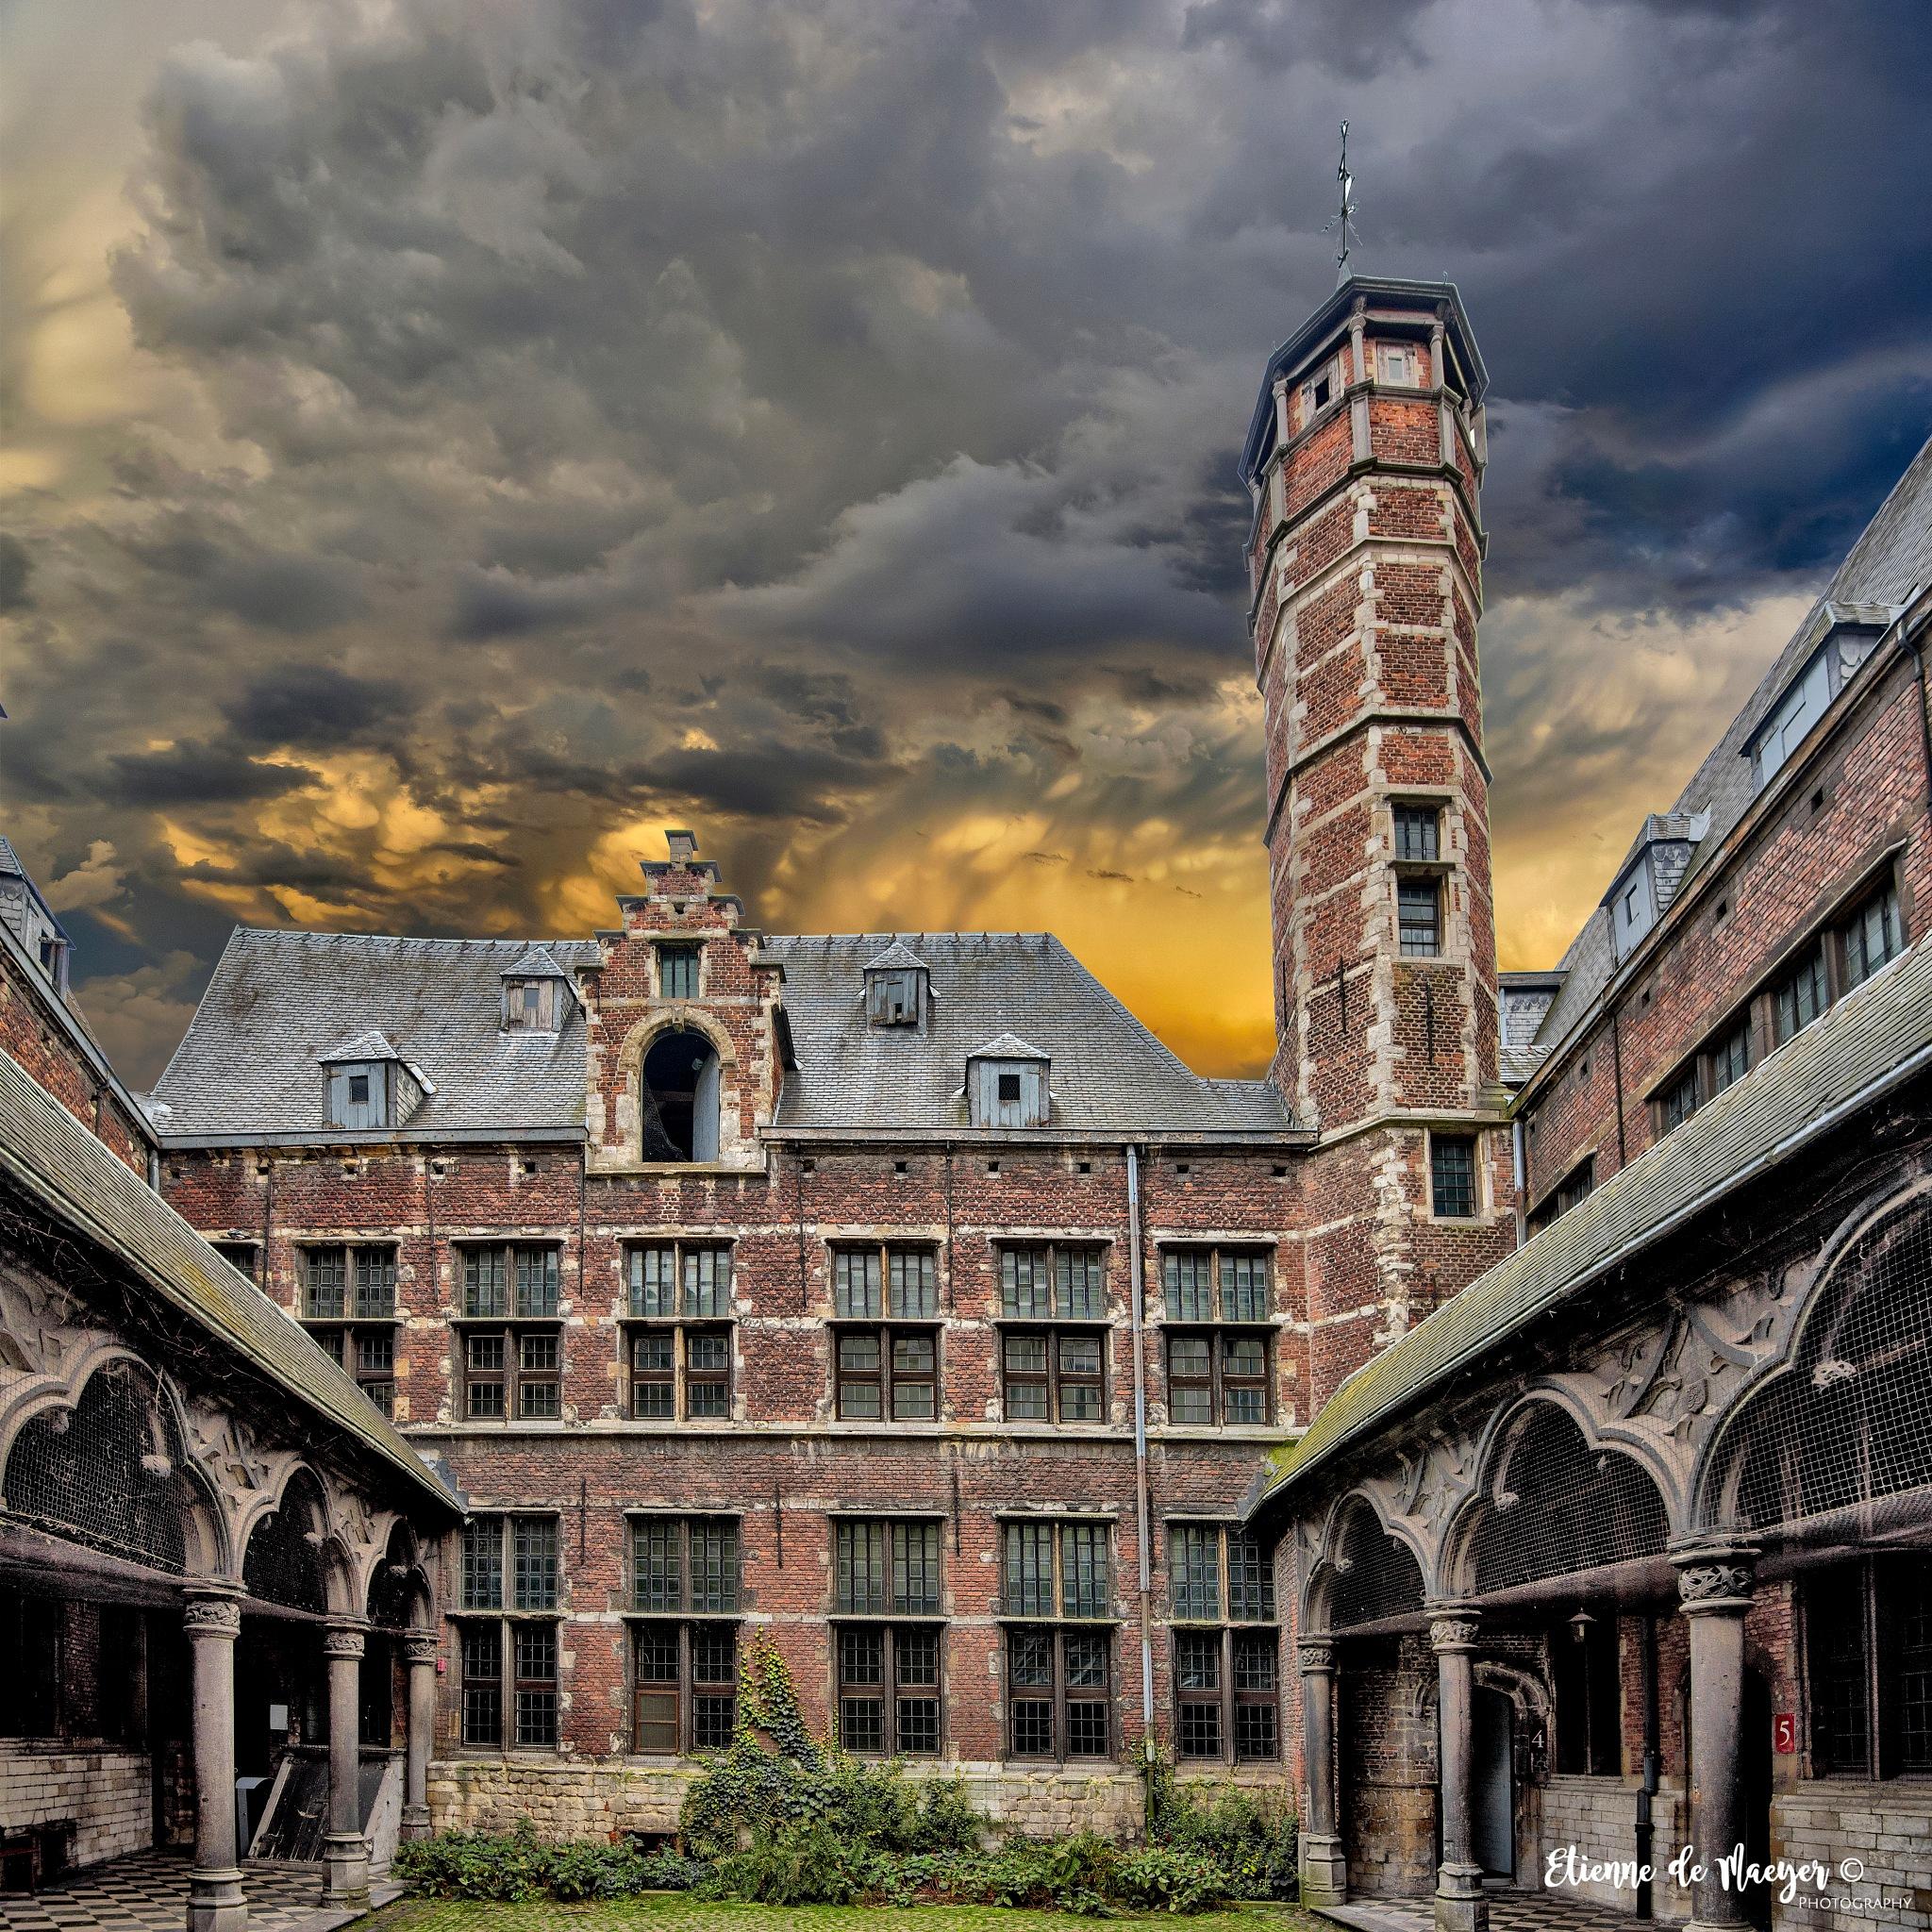 de Pagaddertoren by Etienne de Maeyer